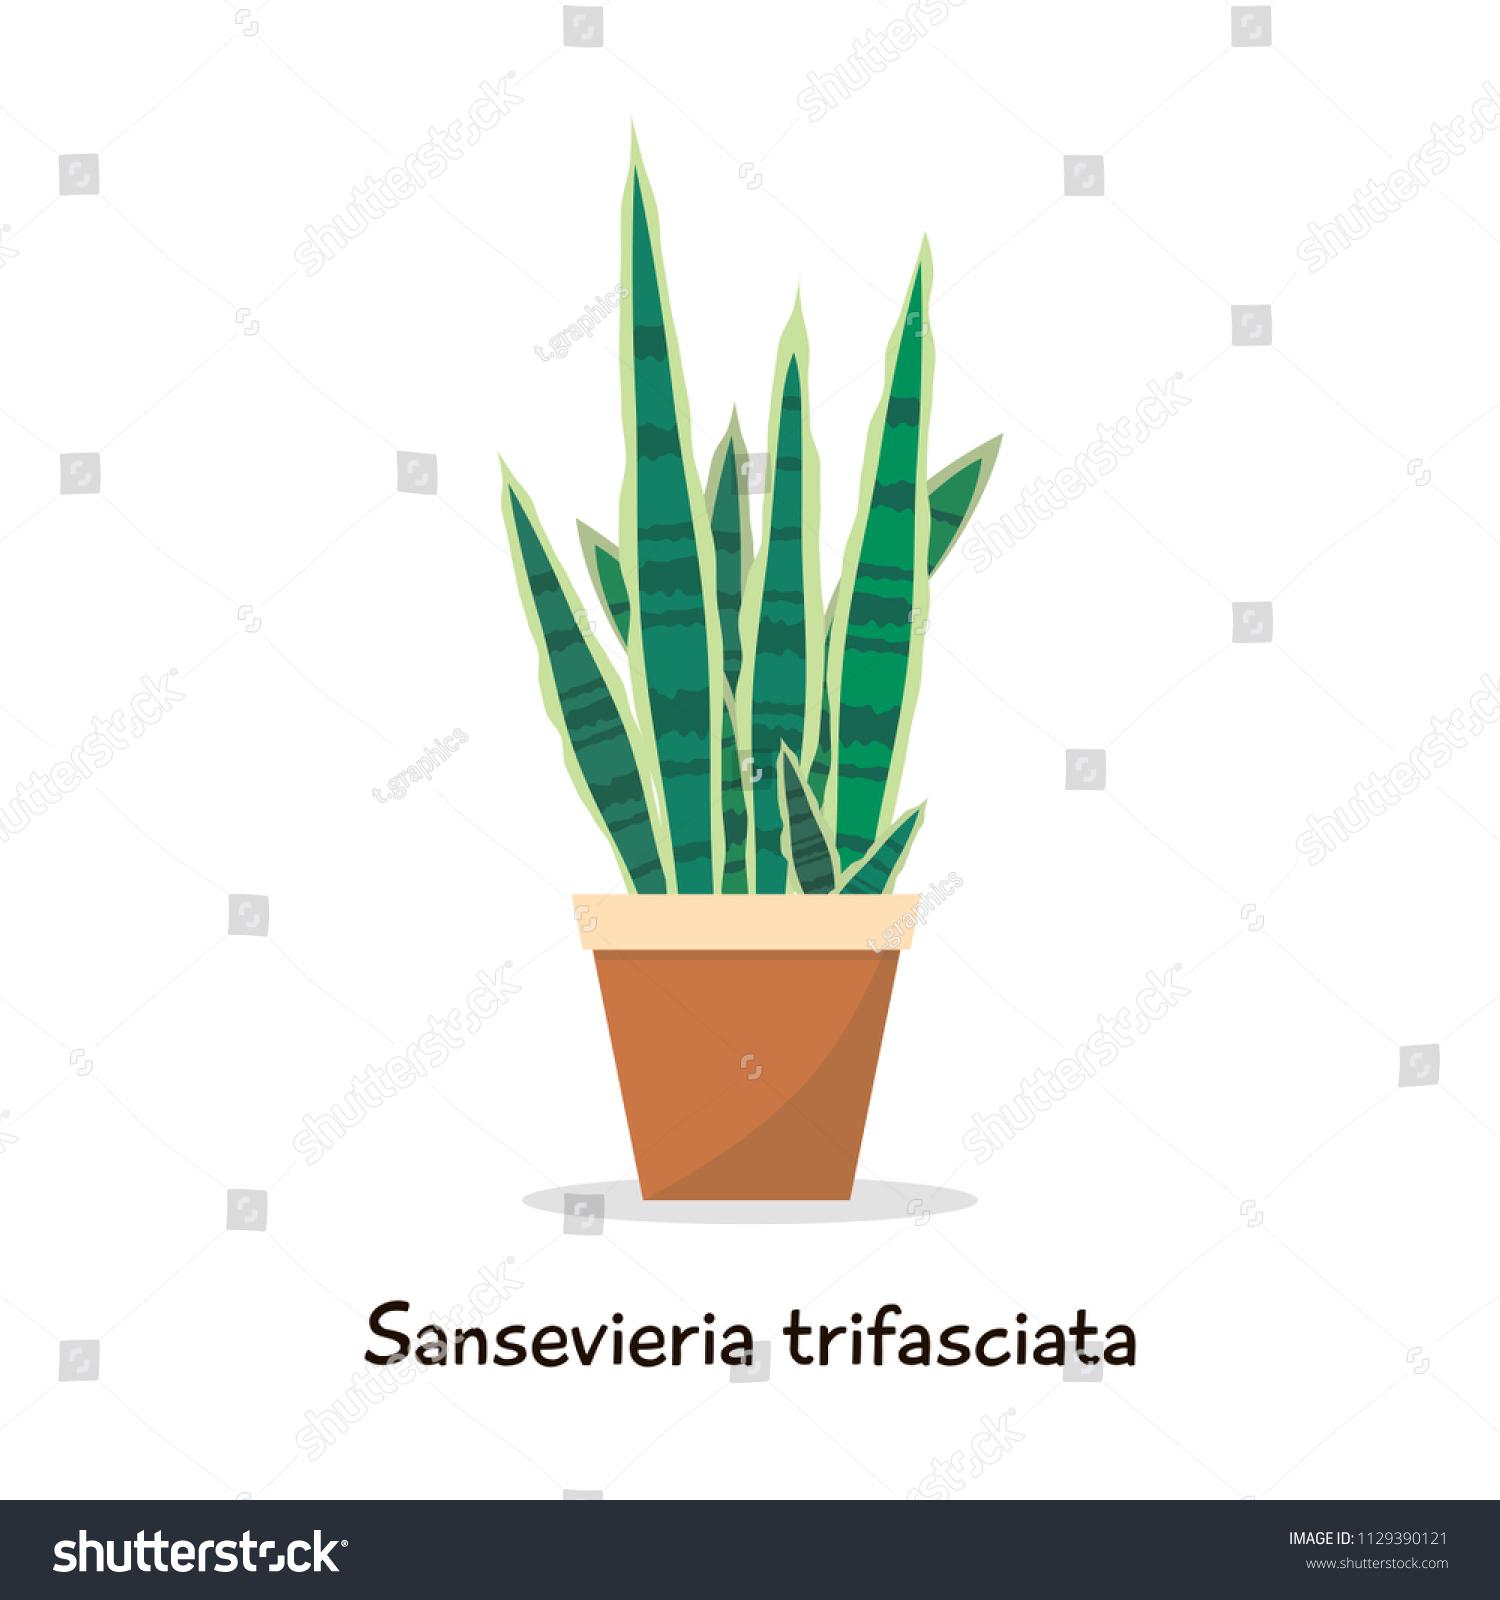 Sansevieria Plant Feng Shui motherinlaw tongue snake plant sansevieria flat stock image